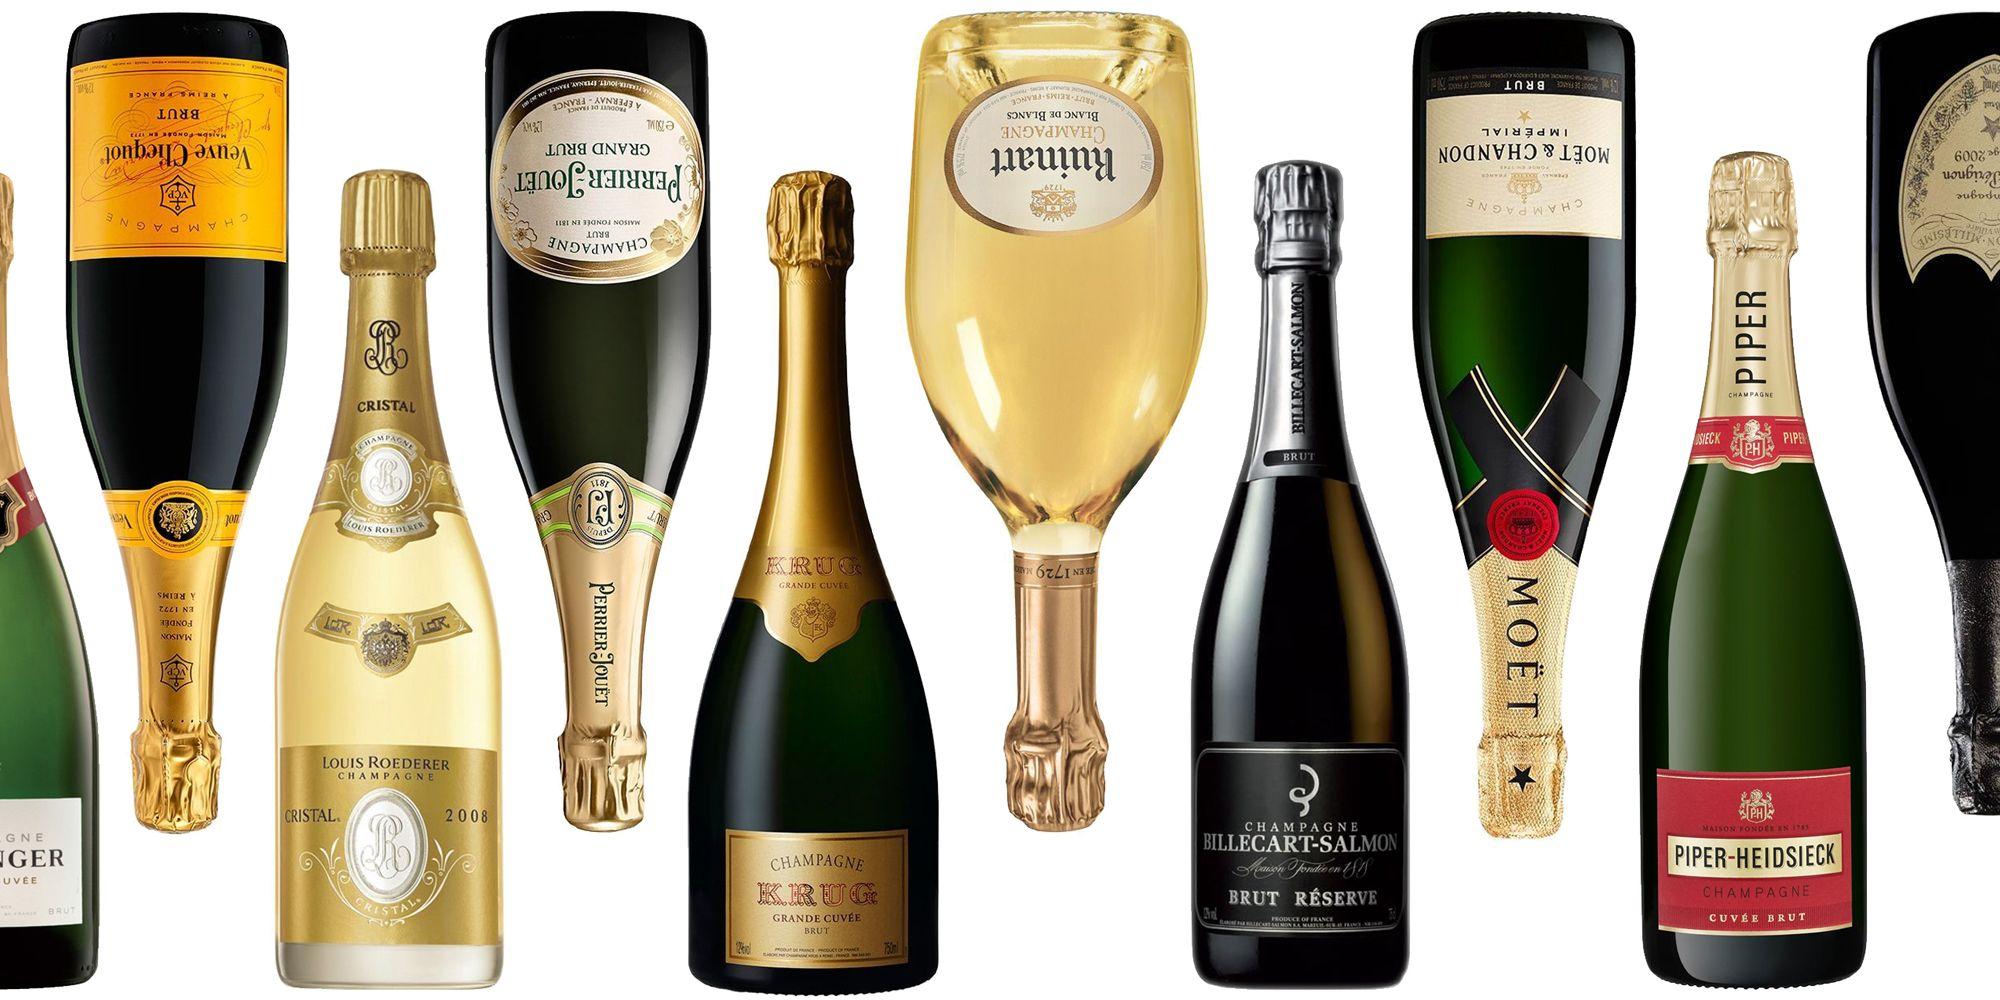 10 best champagne brands